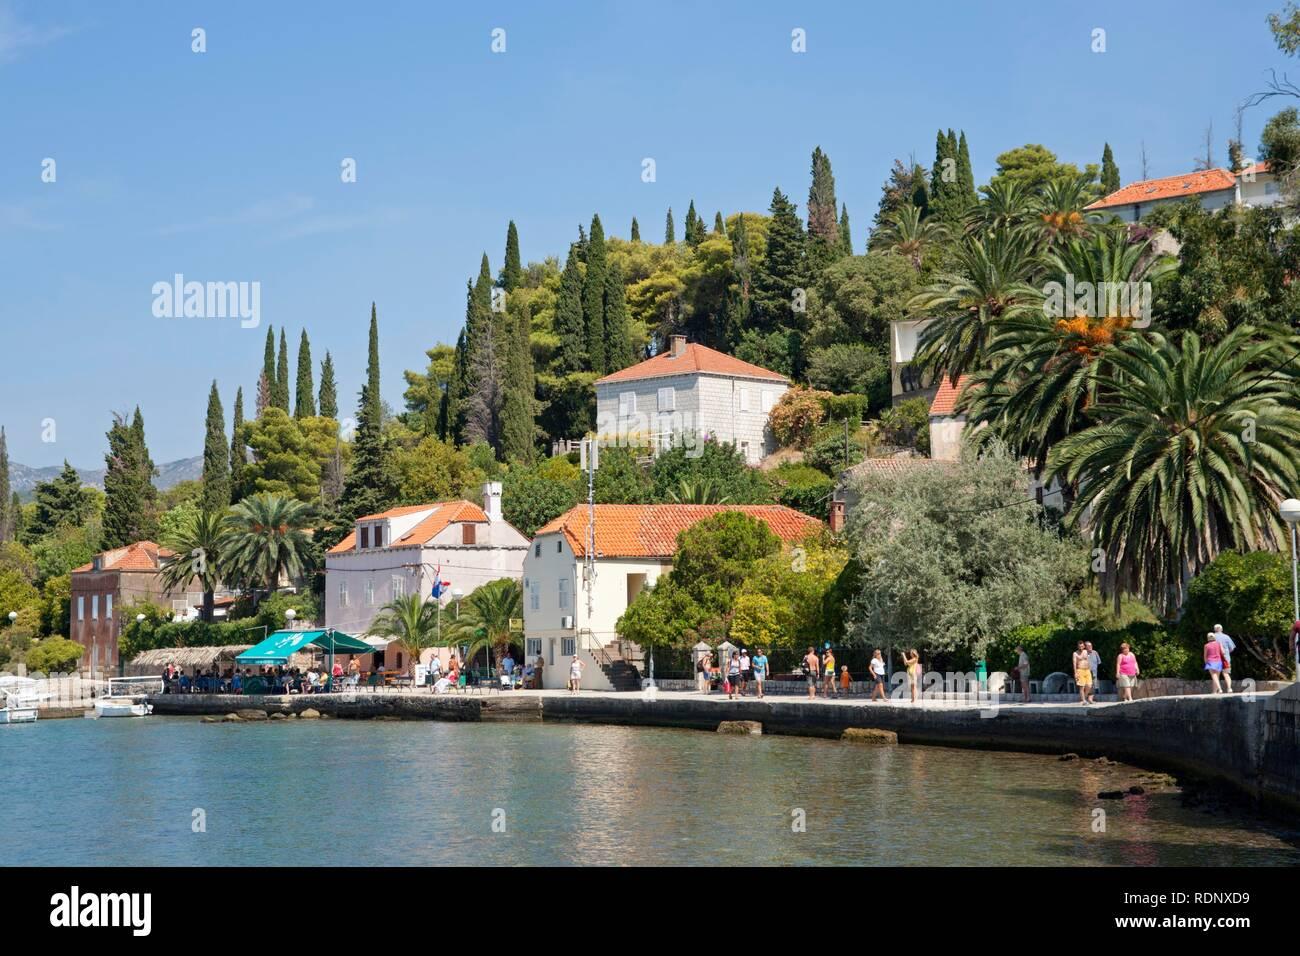 Village on Kolocep Island near Dubrovnik, Elaphiti or Elafiti islands, Southern Dalmatia, Adriatic Coast, Croatia, Europe Stock Photo